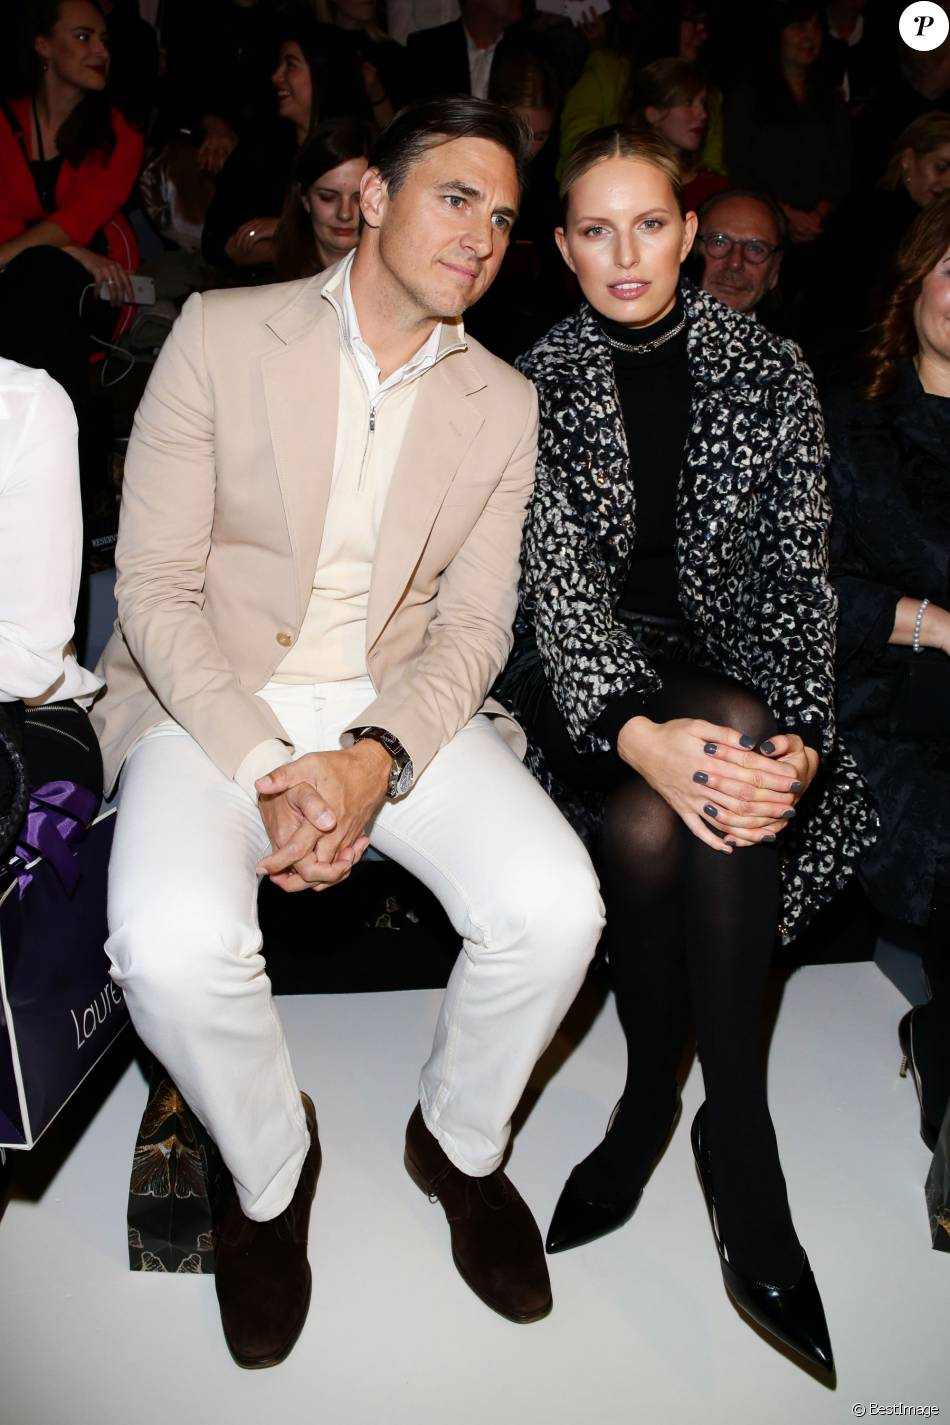 Karolina Kurkova et son mari Archie Drury assistent au défilé de mode Guido Maria Kretschmer Berlin à la Fashion Week de Berlin. Le 20 janvier 2016.